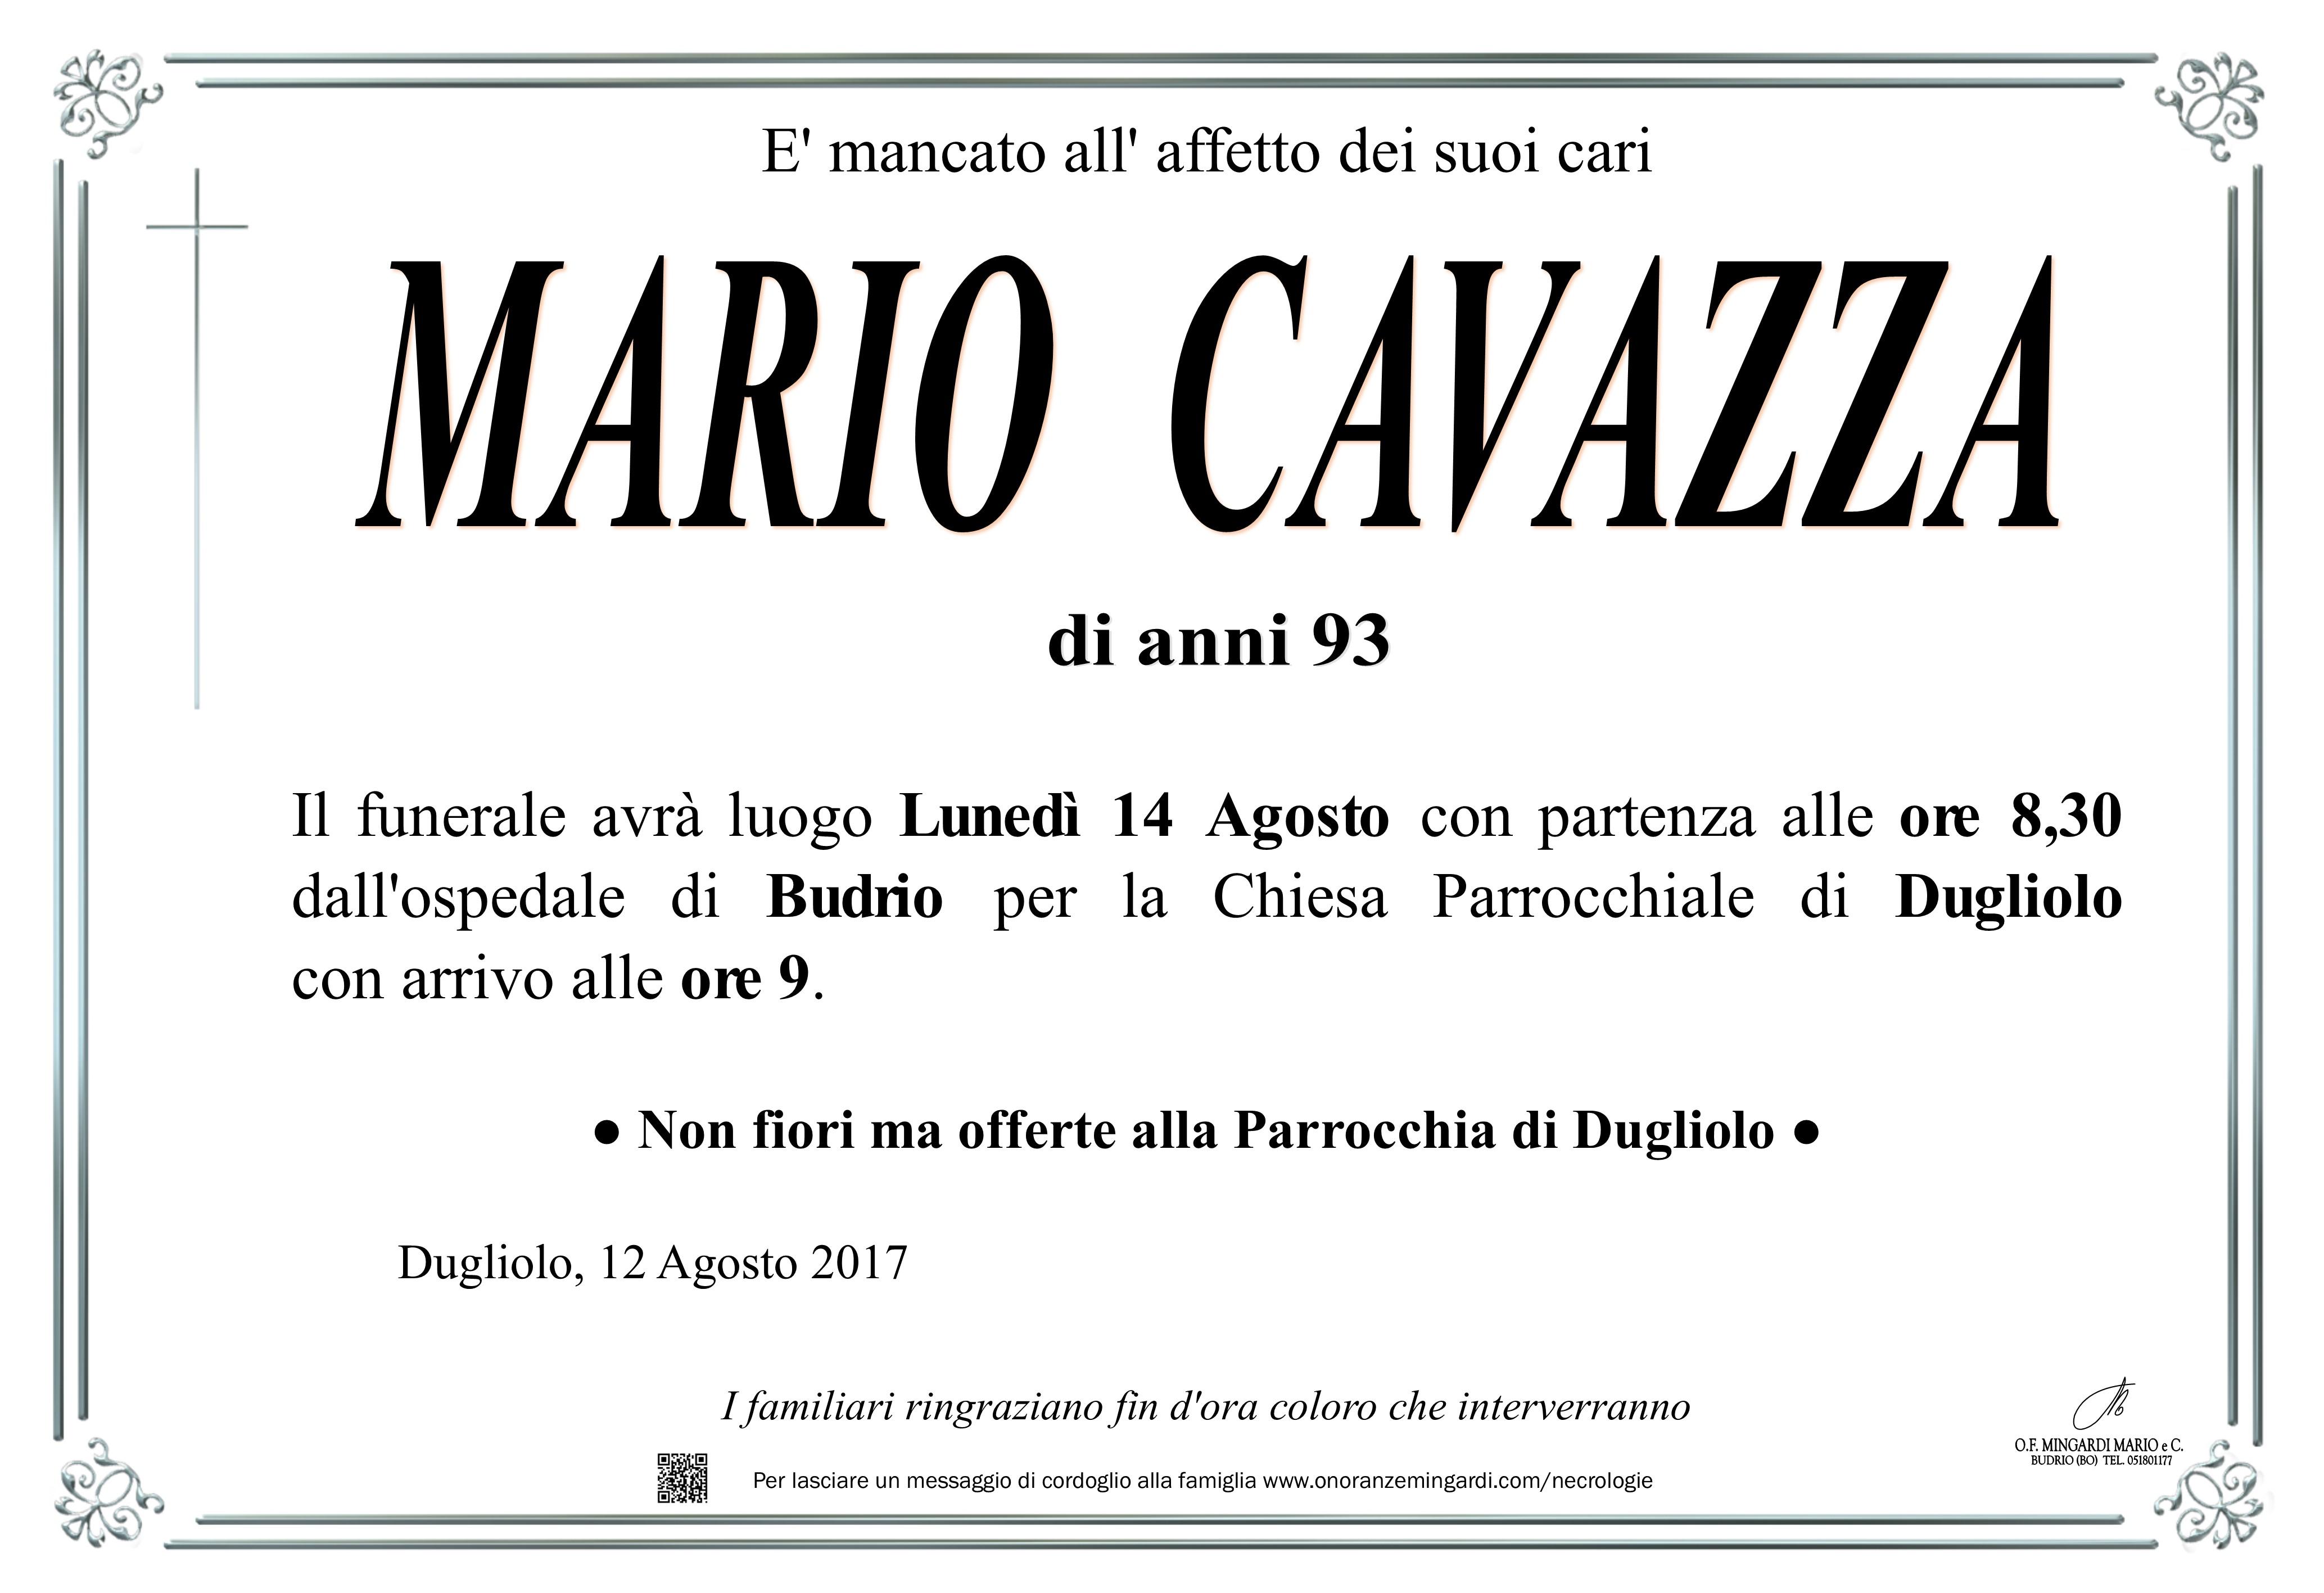 MANIFESTI MARIO CAVAZZA